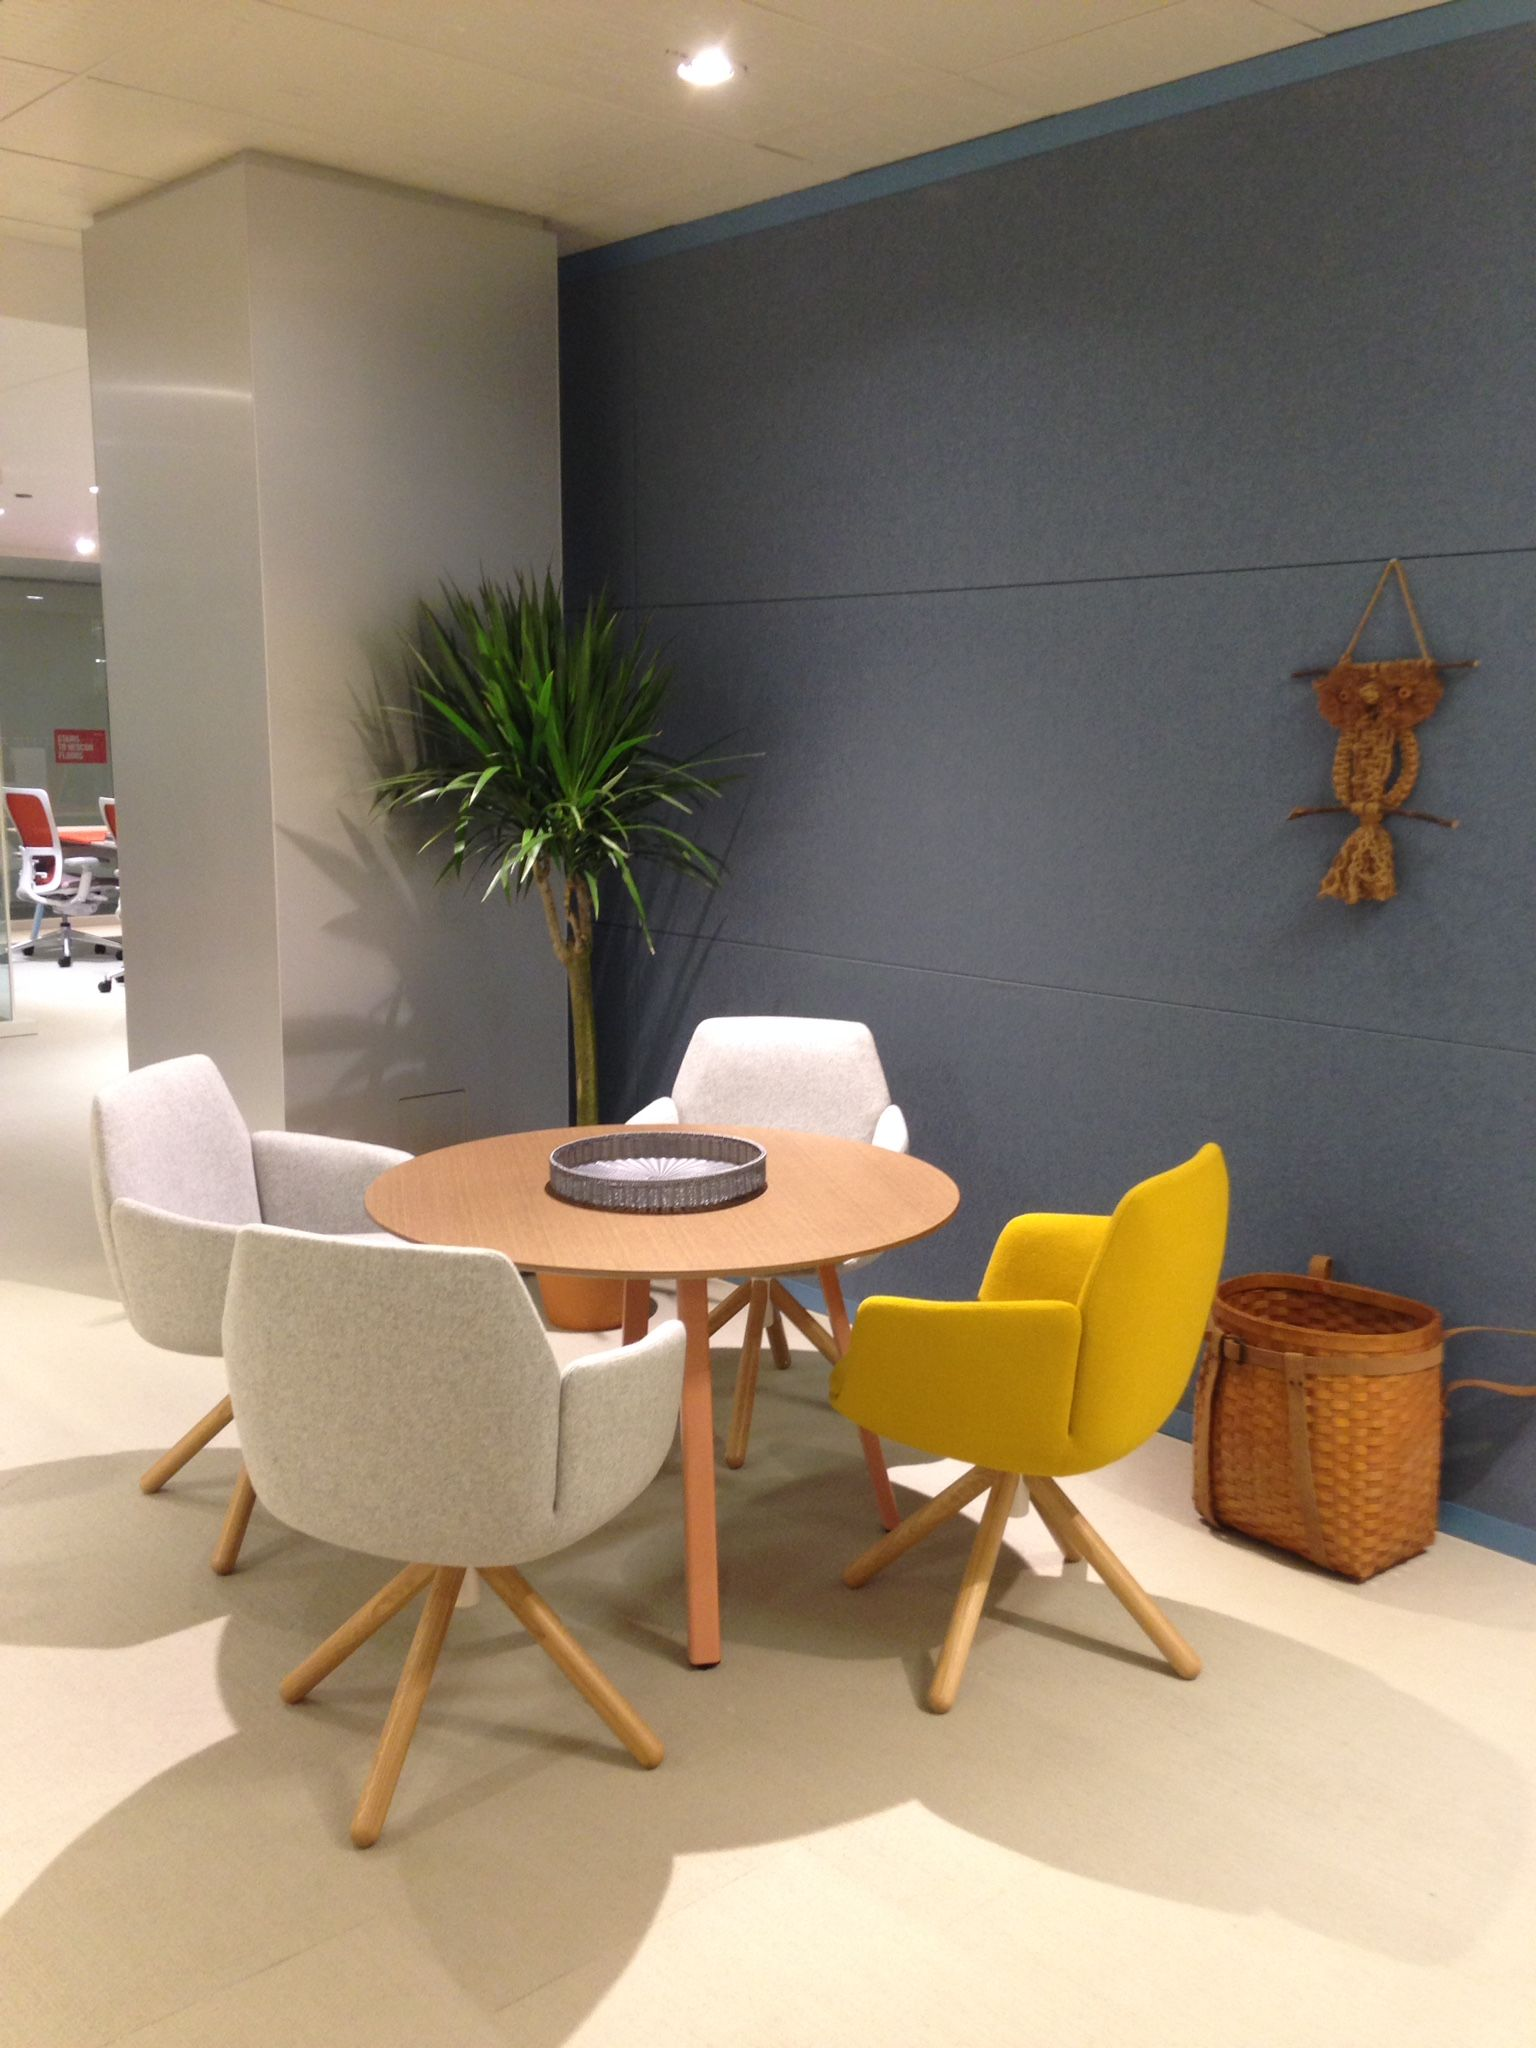 Poppy chairs in a fun arrangement Designed